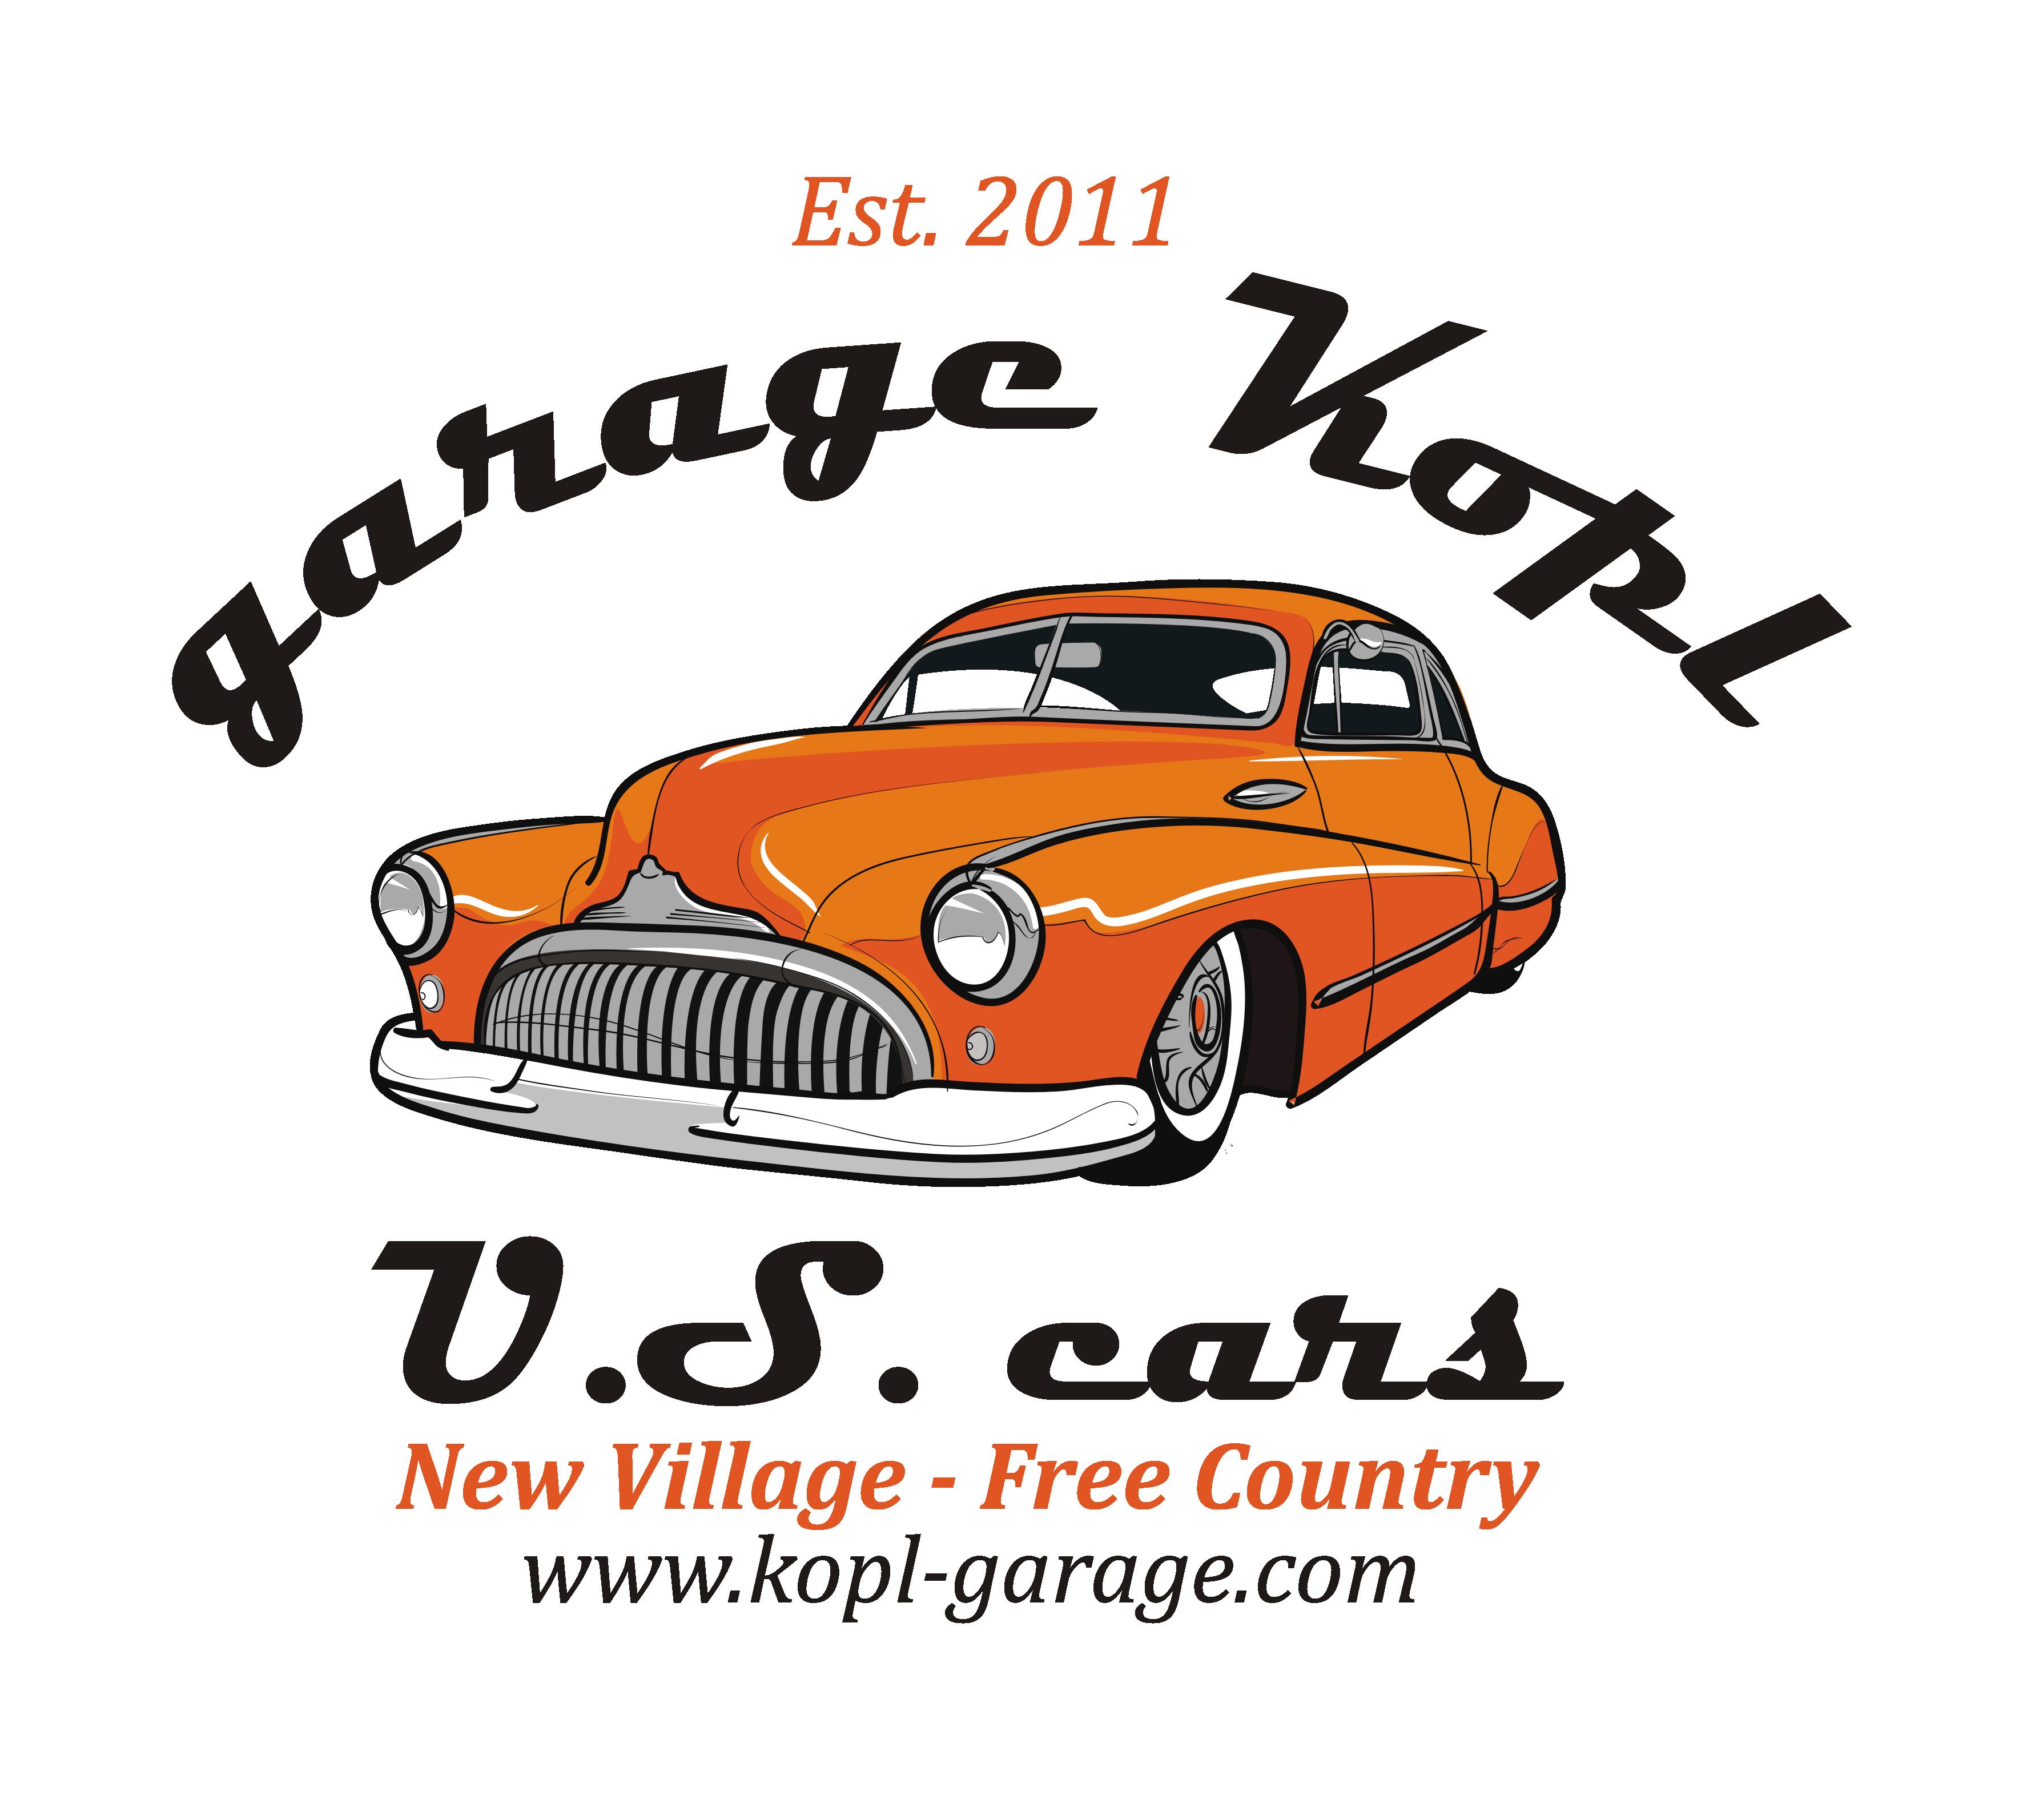 Kopl-garage.com